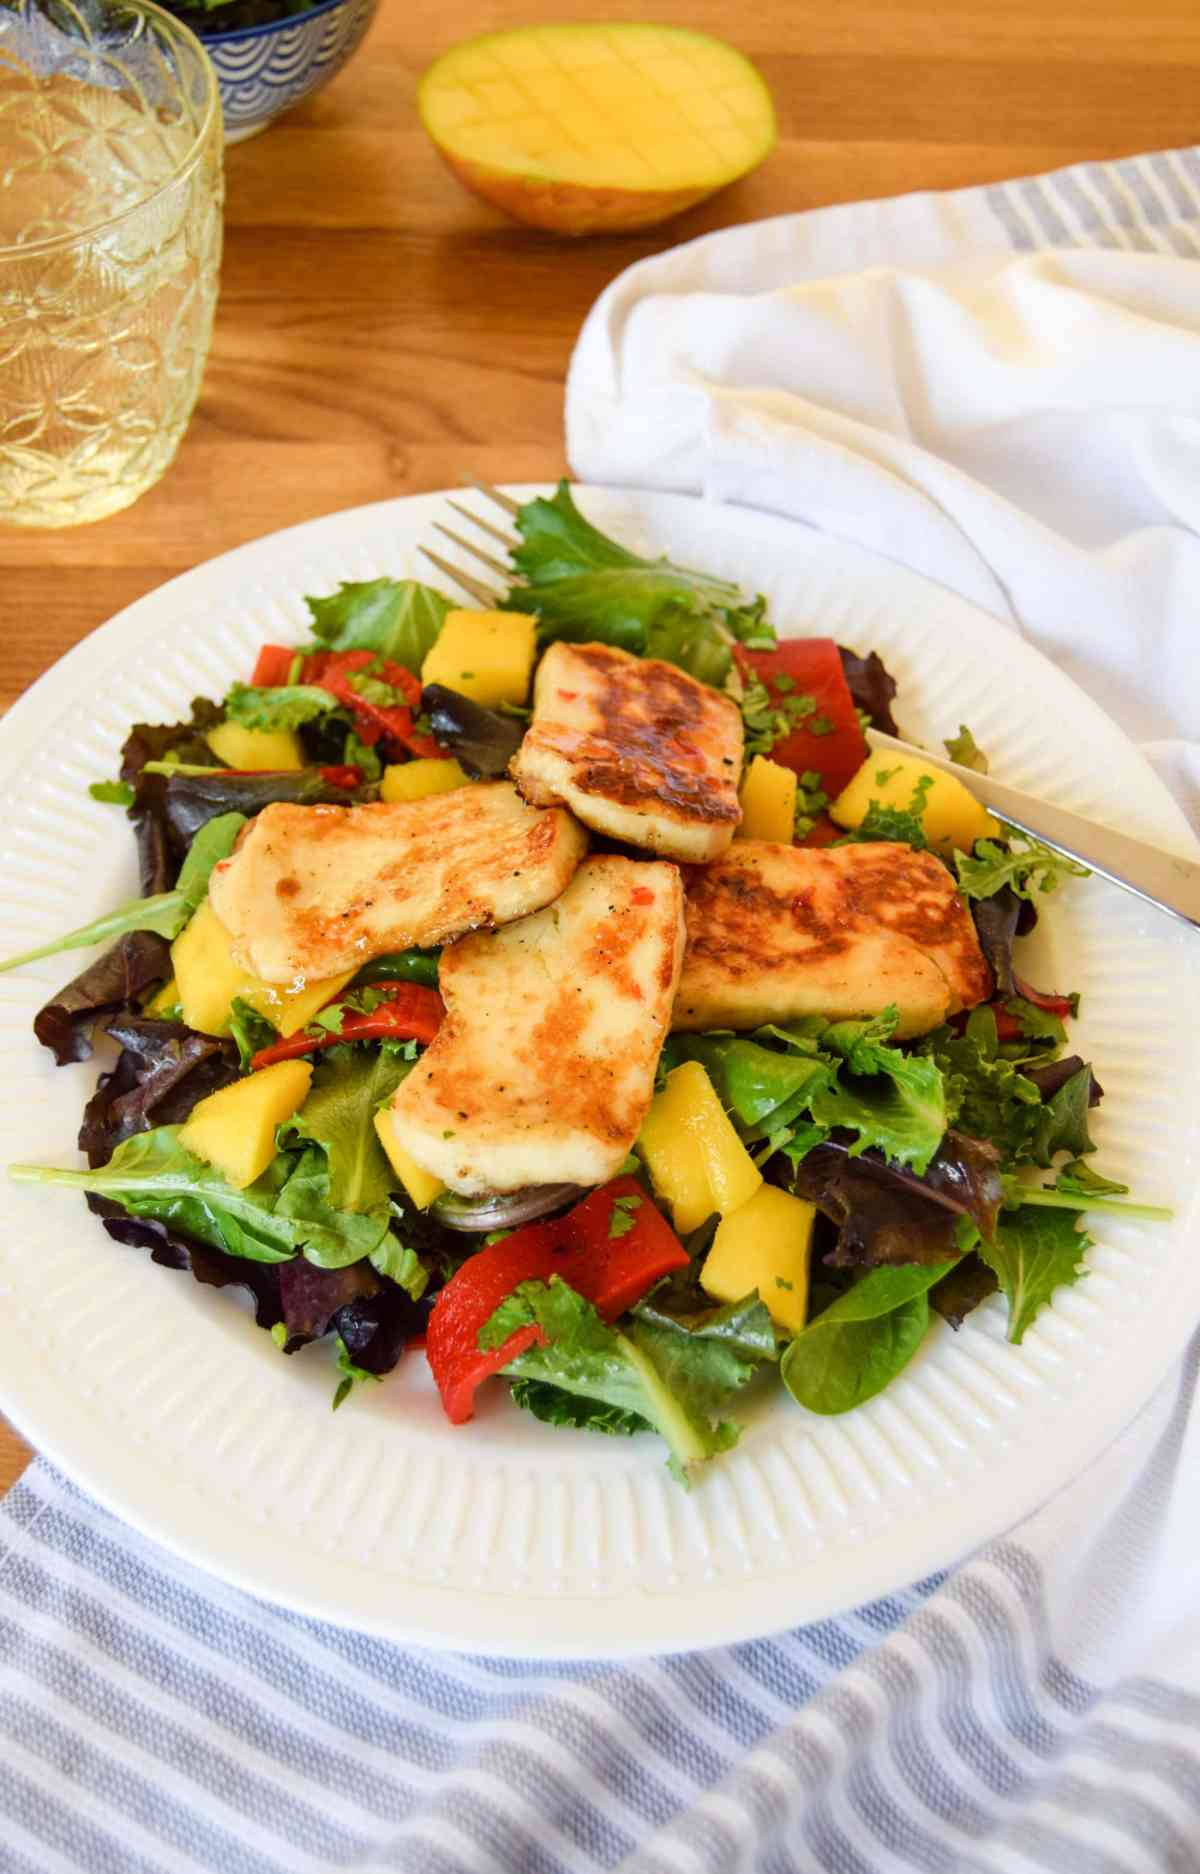 sweet chili halloumi and mango salad on a plate